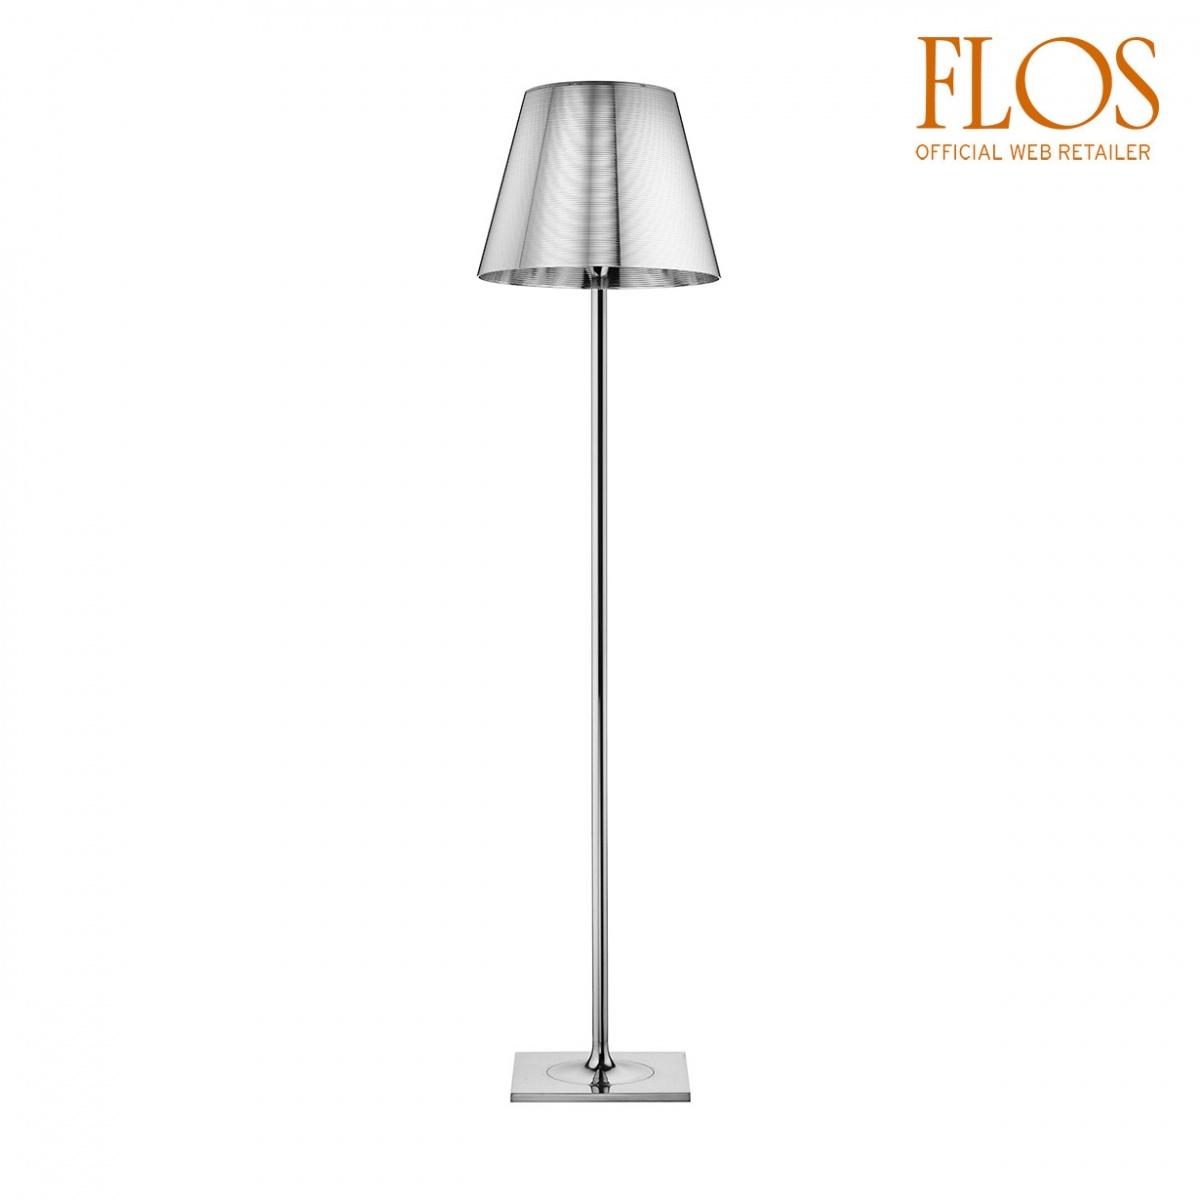 Beautiful lampade da terra flos images acrylicgiftware for Flos illuminazione